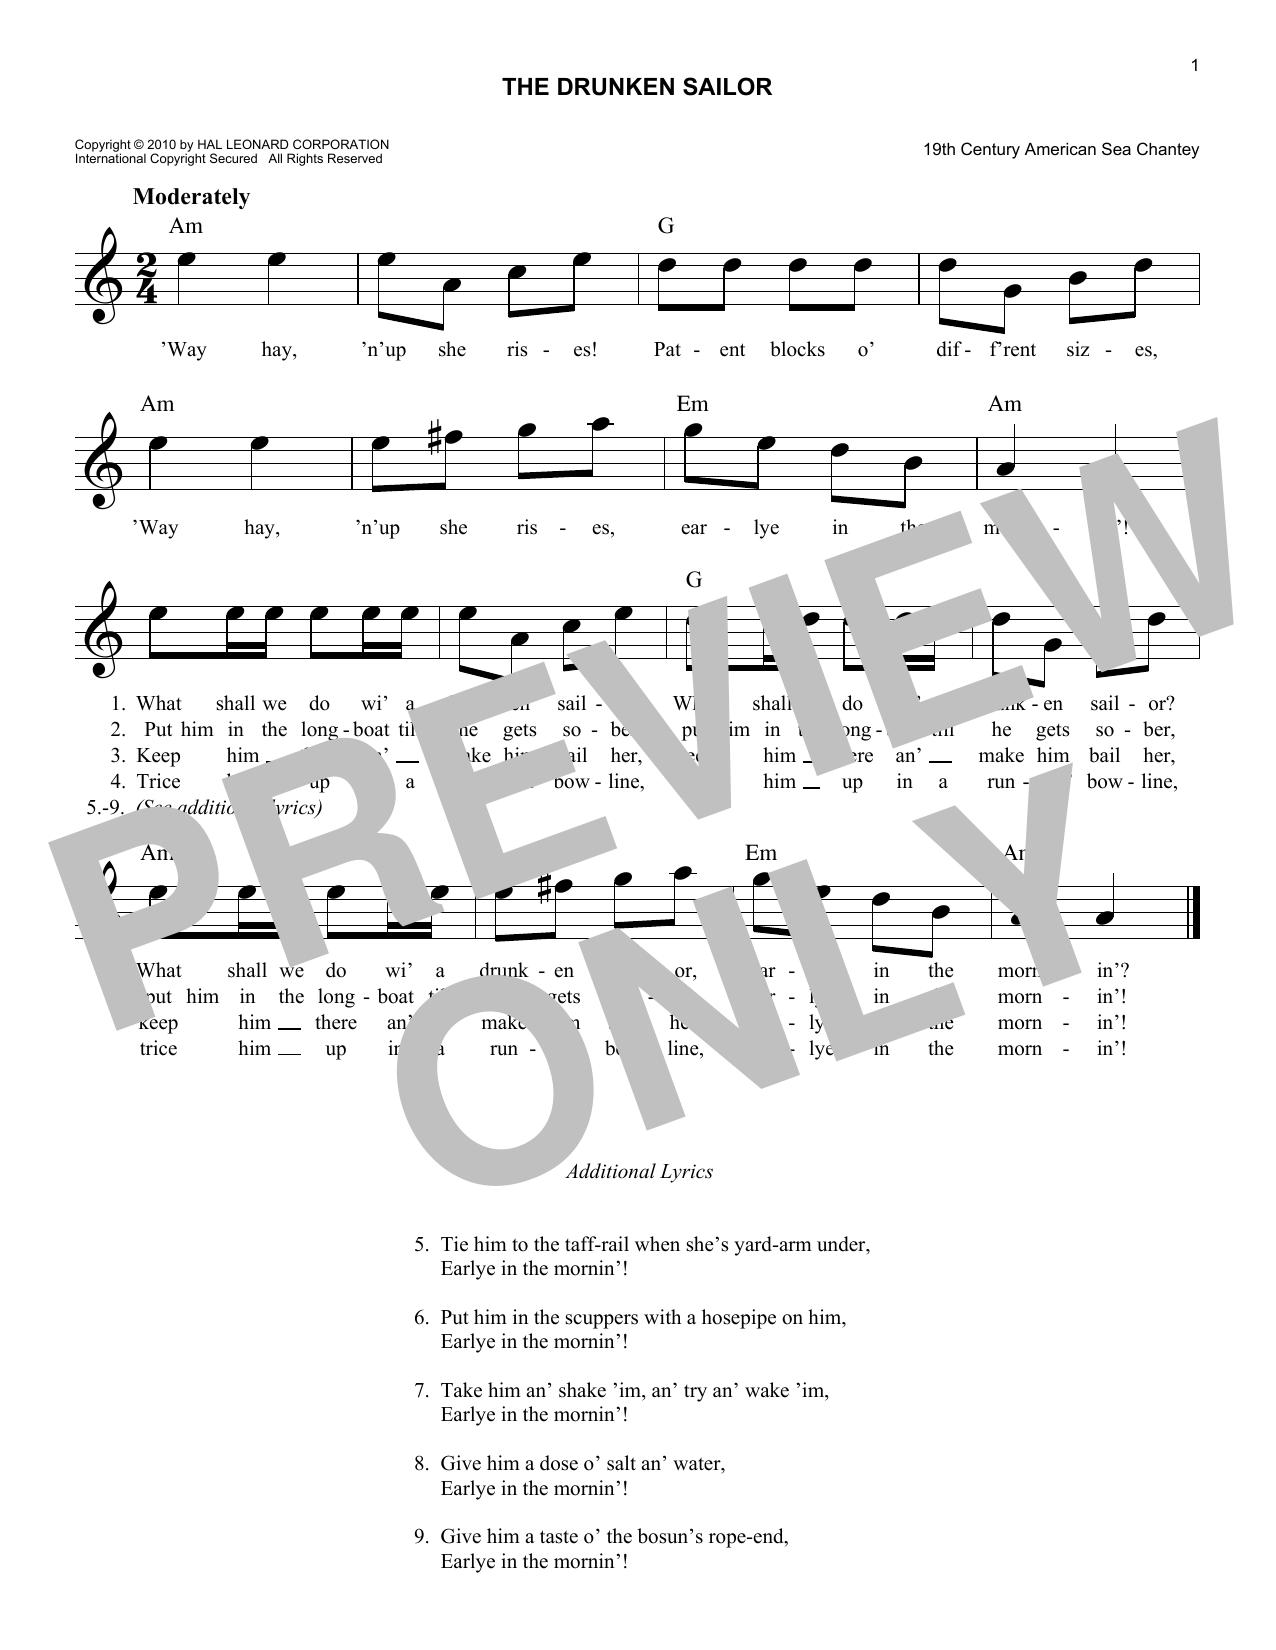 The Drunken Sailor Sheet Music